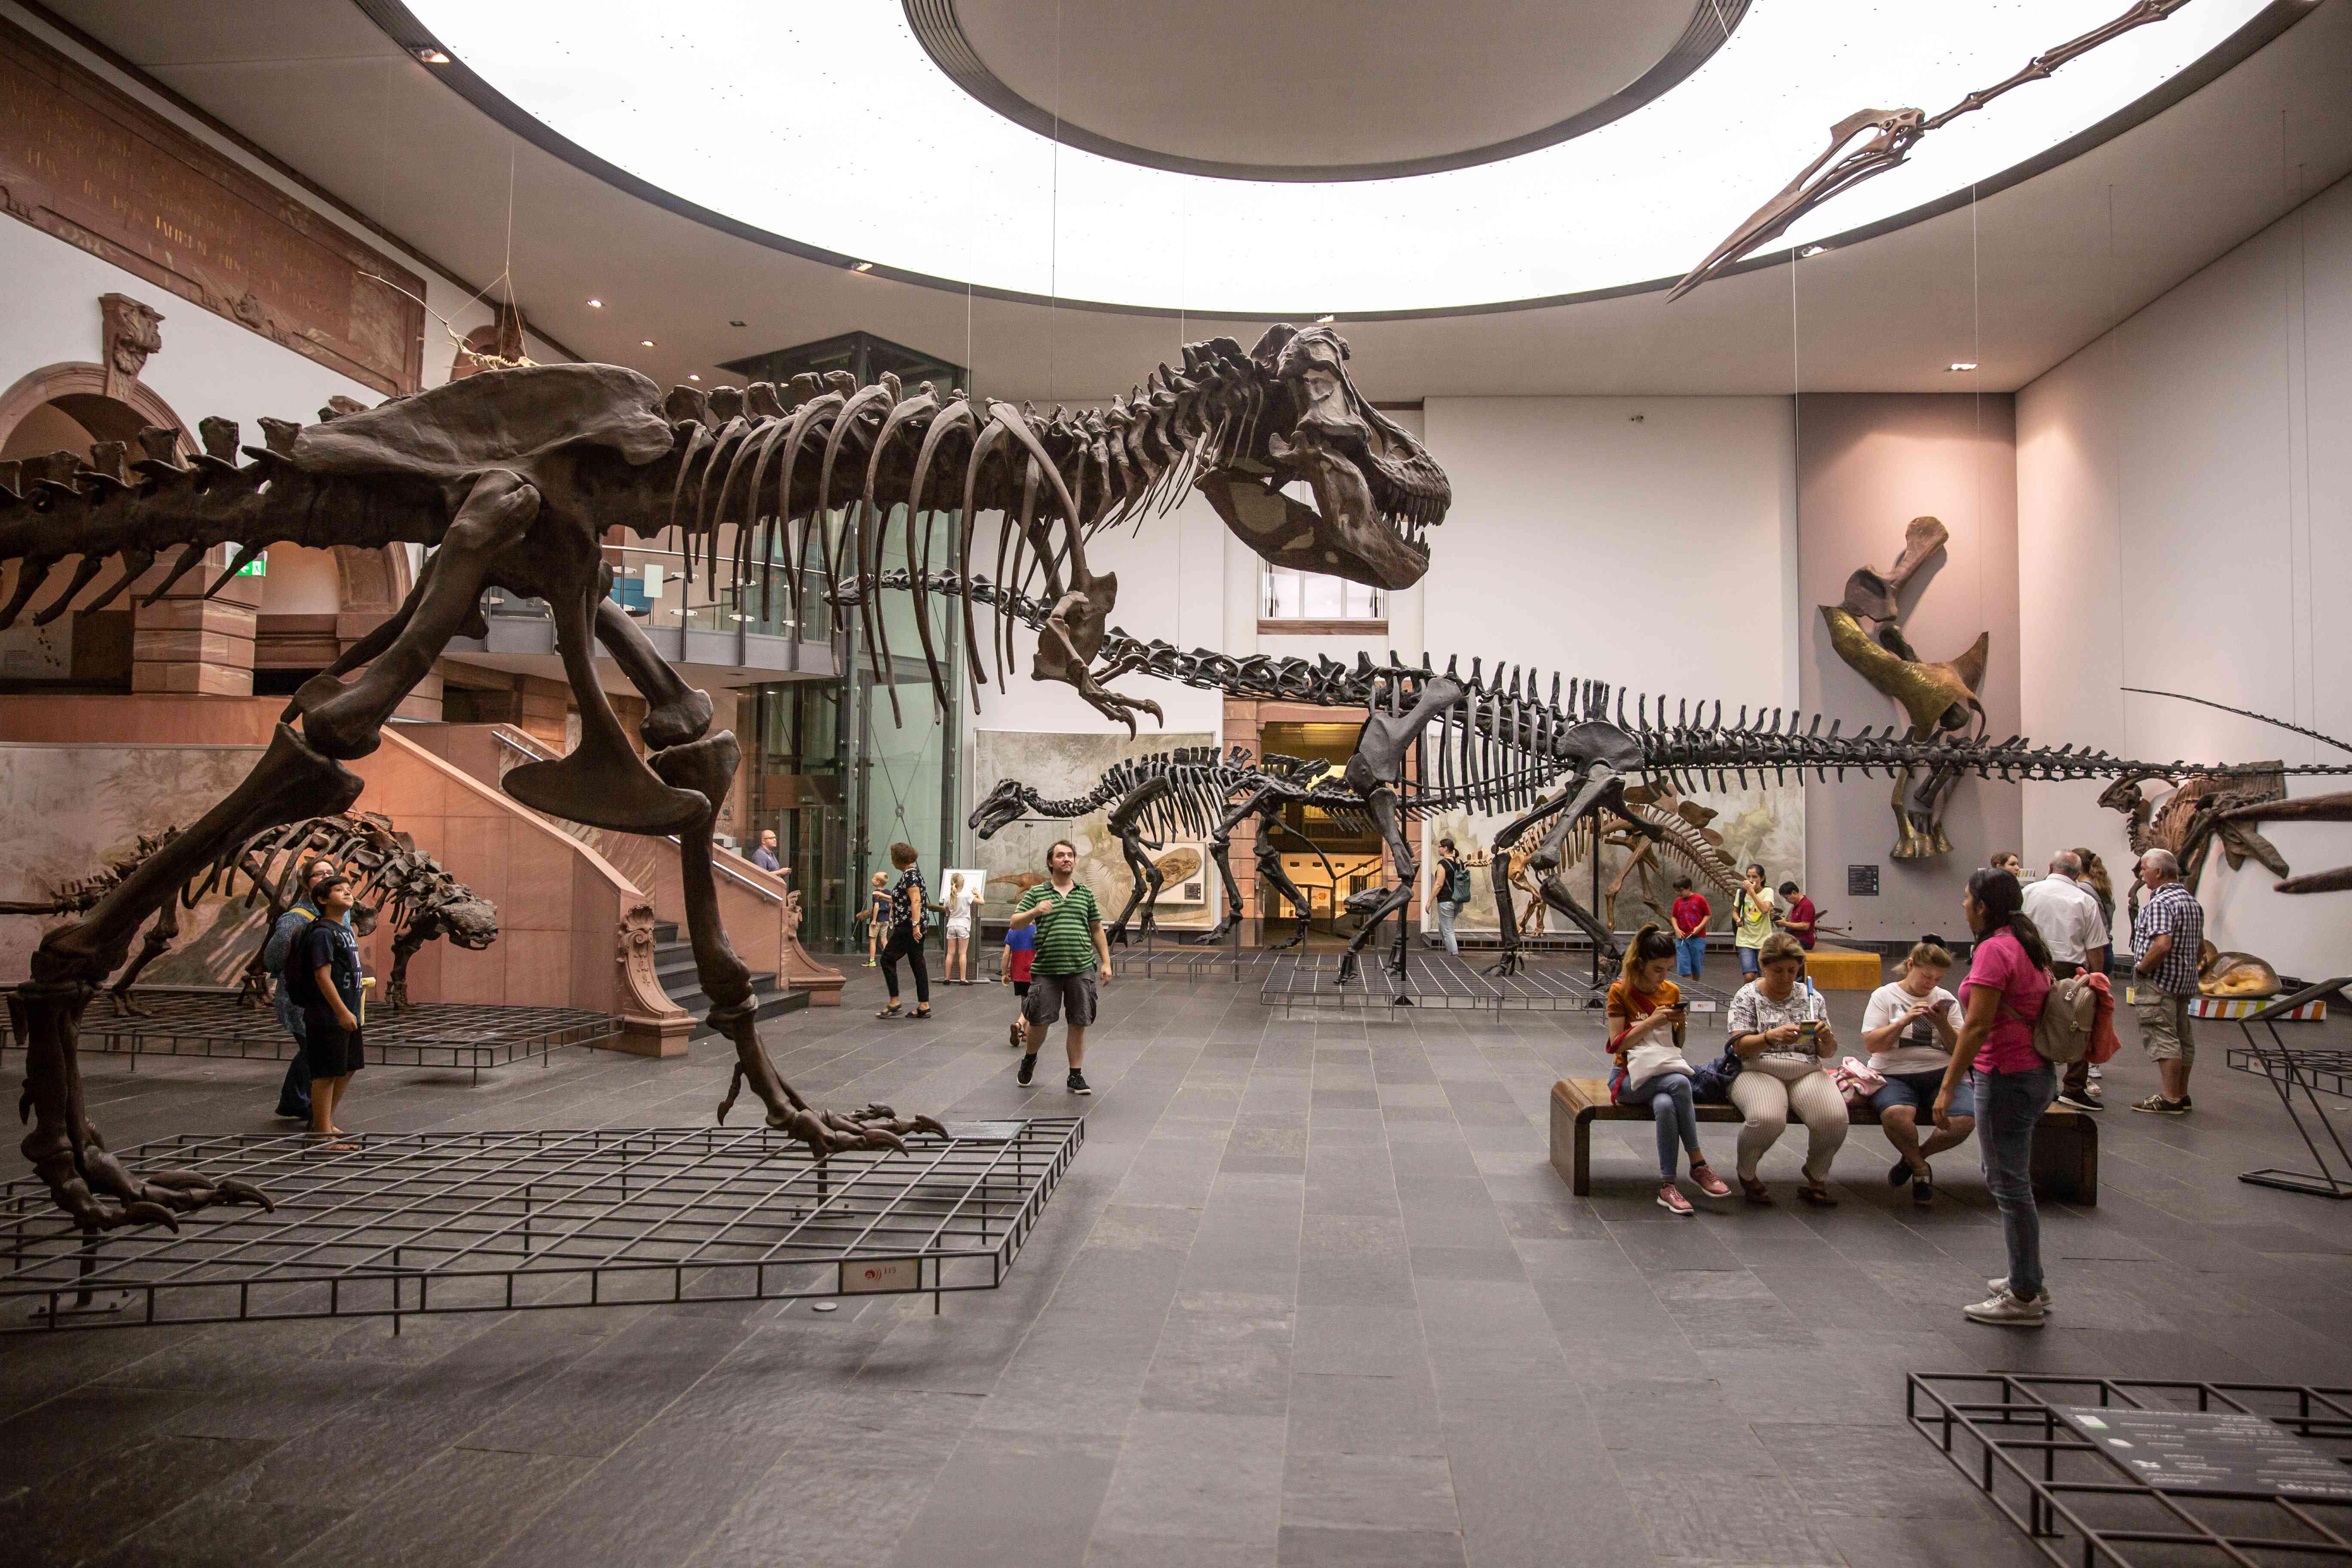 Dinosaur skeletons at the Senckenberg Museum